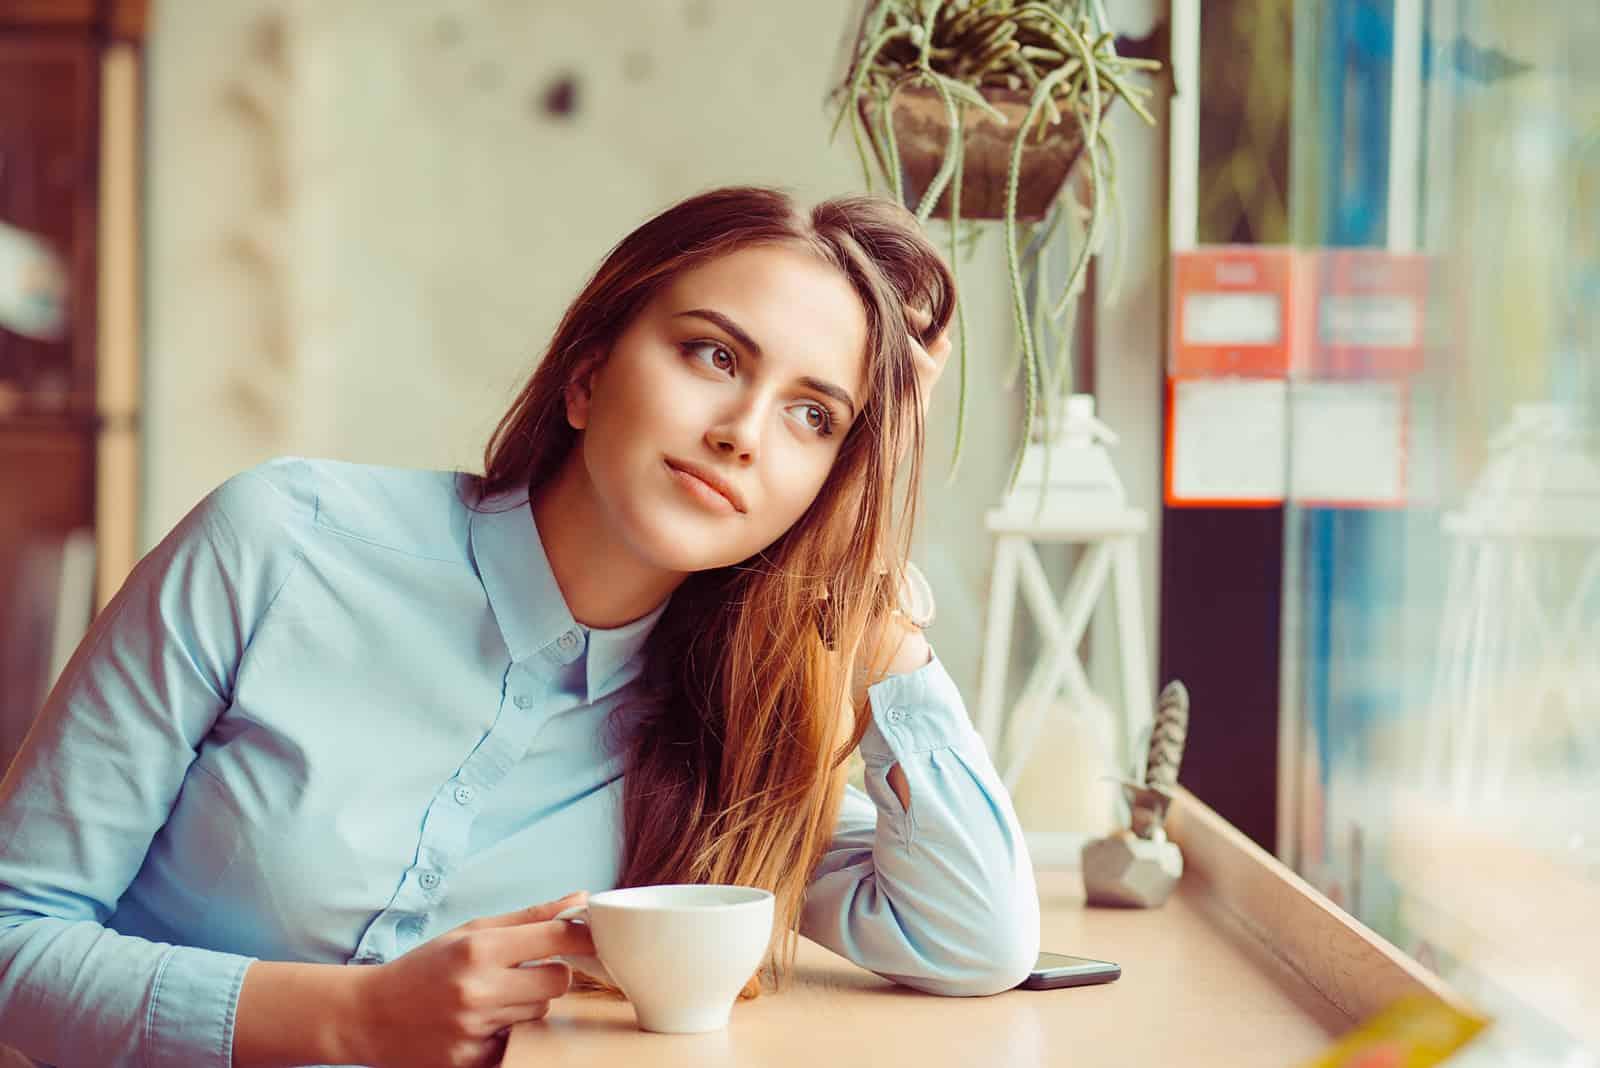 eine imaginäre Frau, die Kaffee trinkt